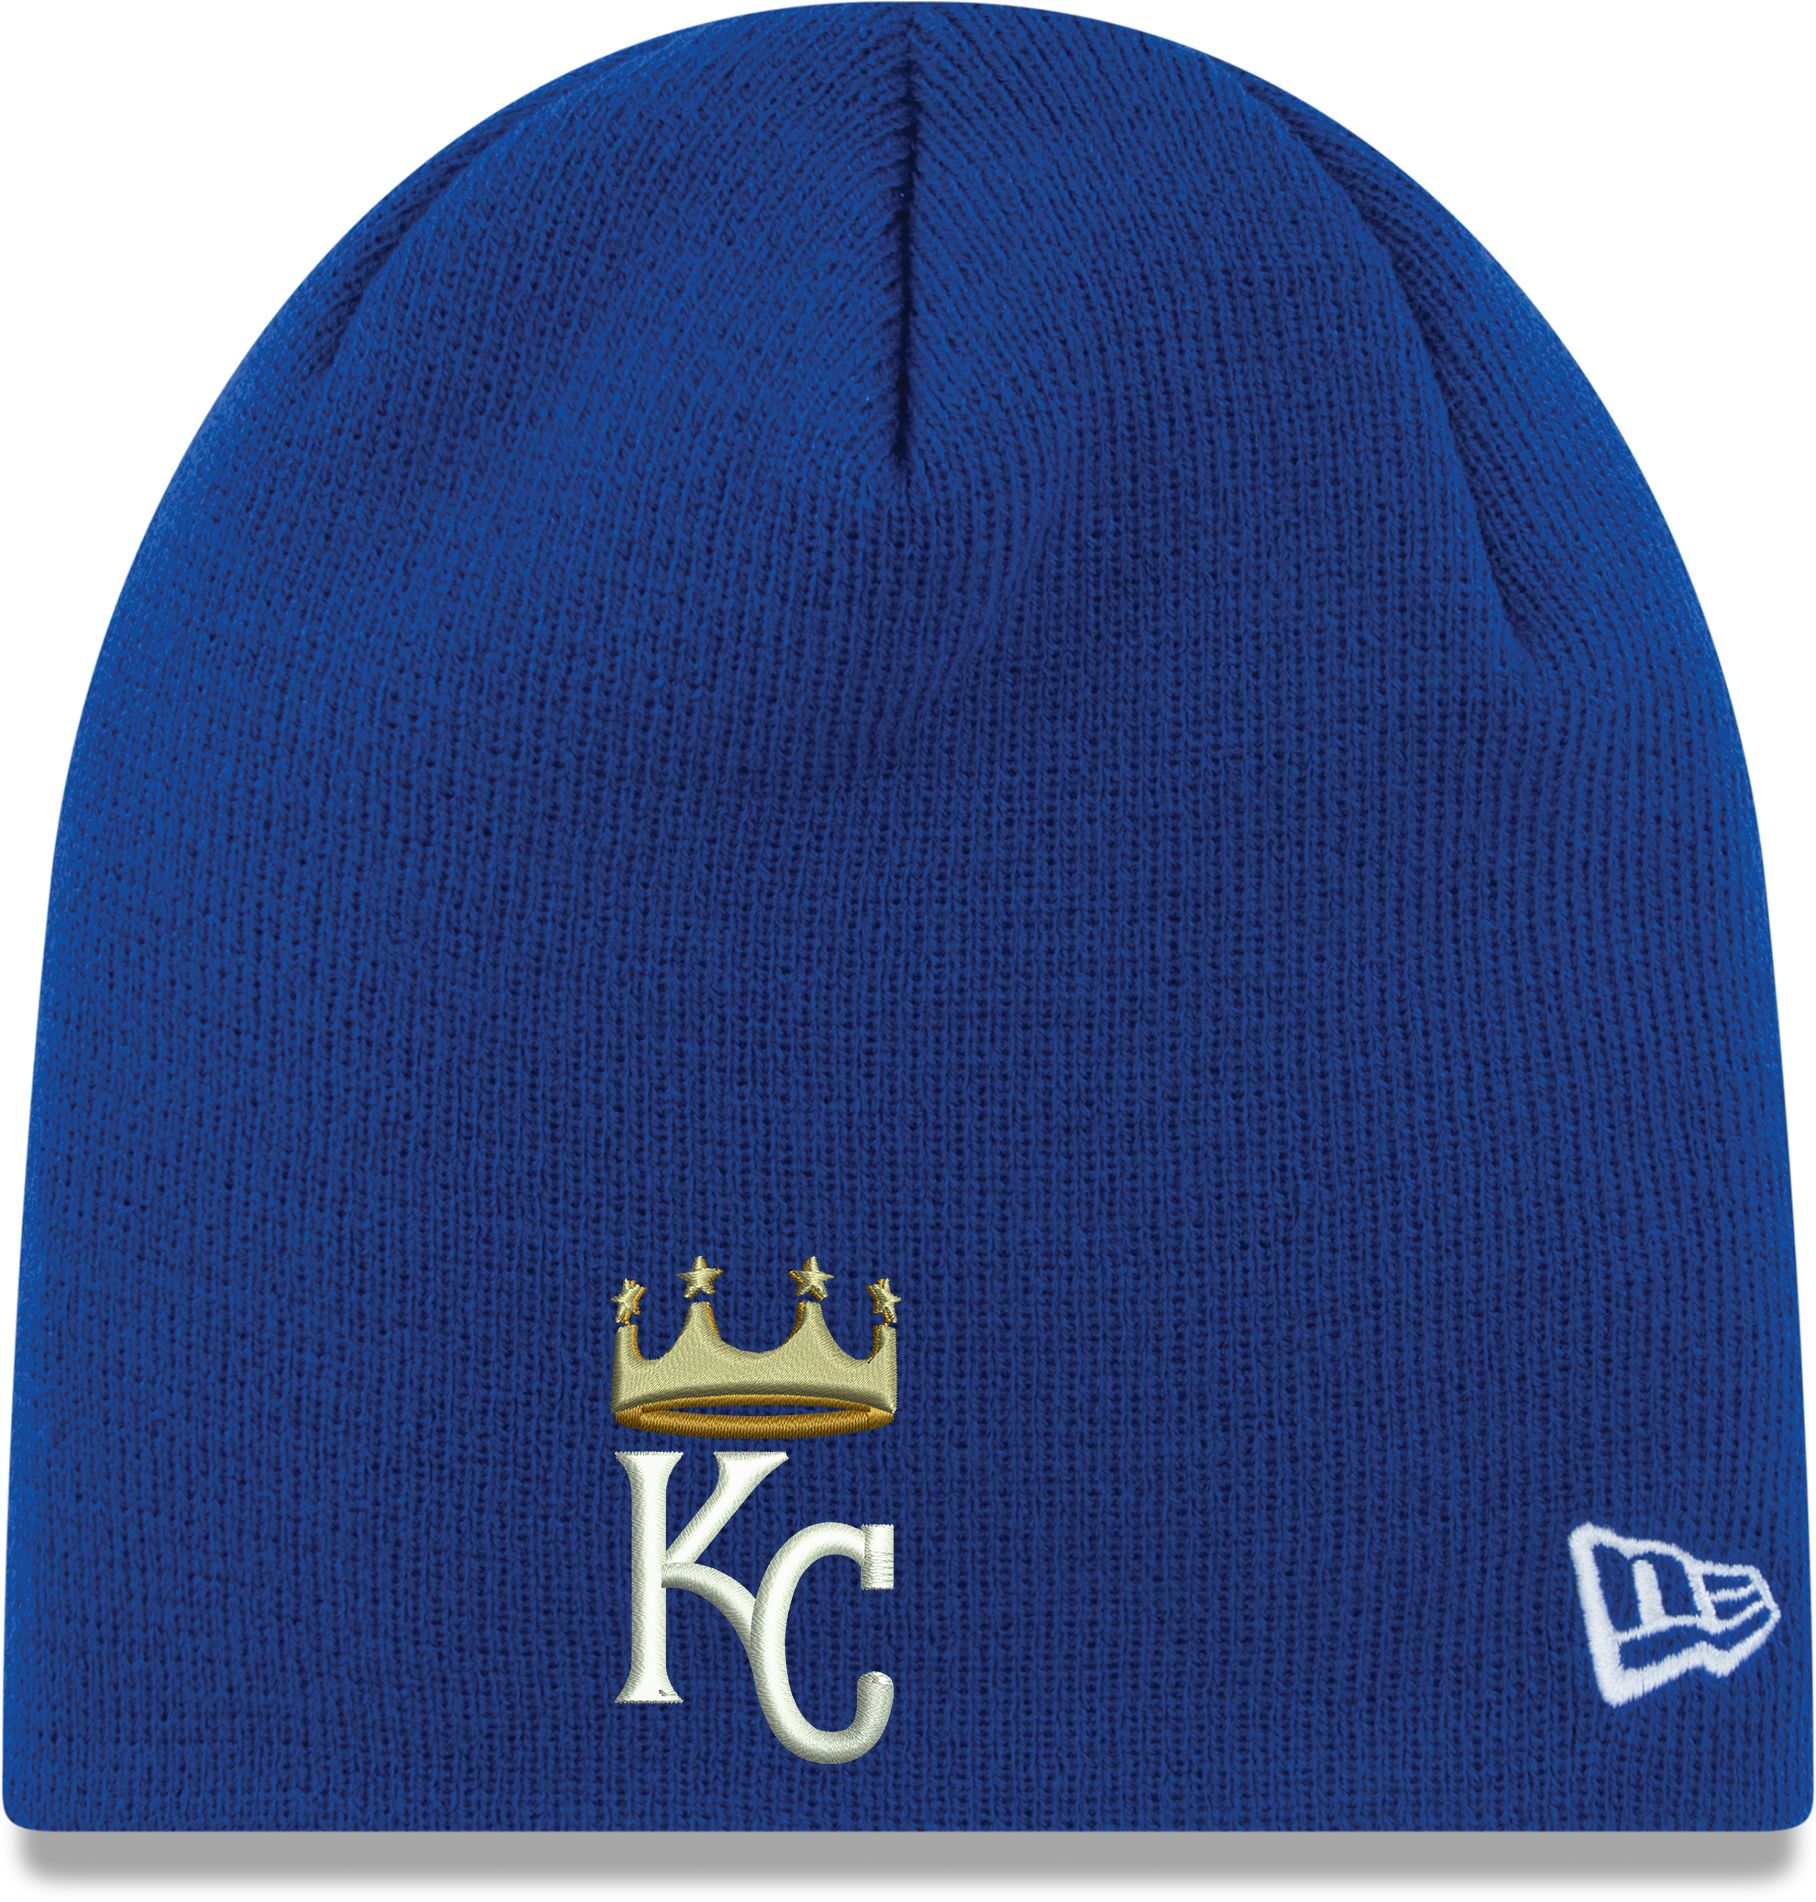 030d50bdbcb ... wholesale new era mens kansas city royals knit hat dicks sporting goods  721c9 1b891 ...